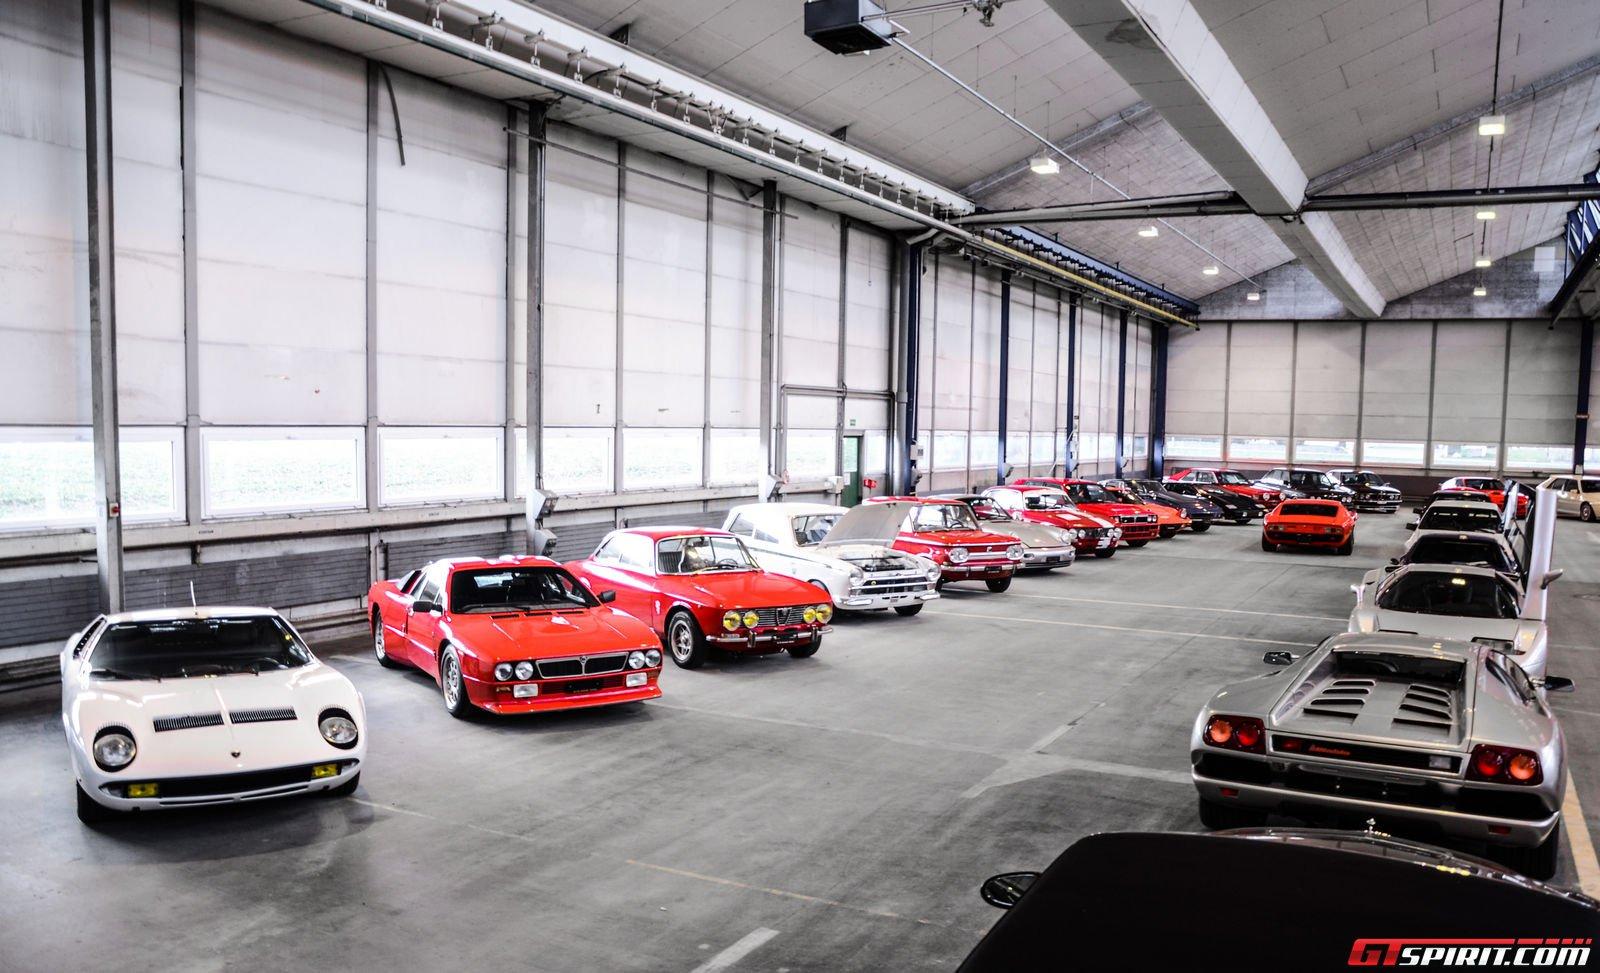 Exclusive elite garage a dream collection for A1 car garage